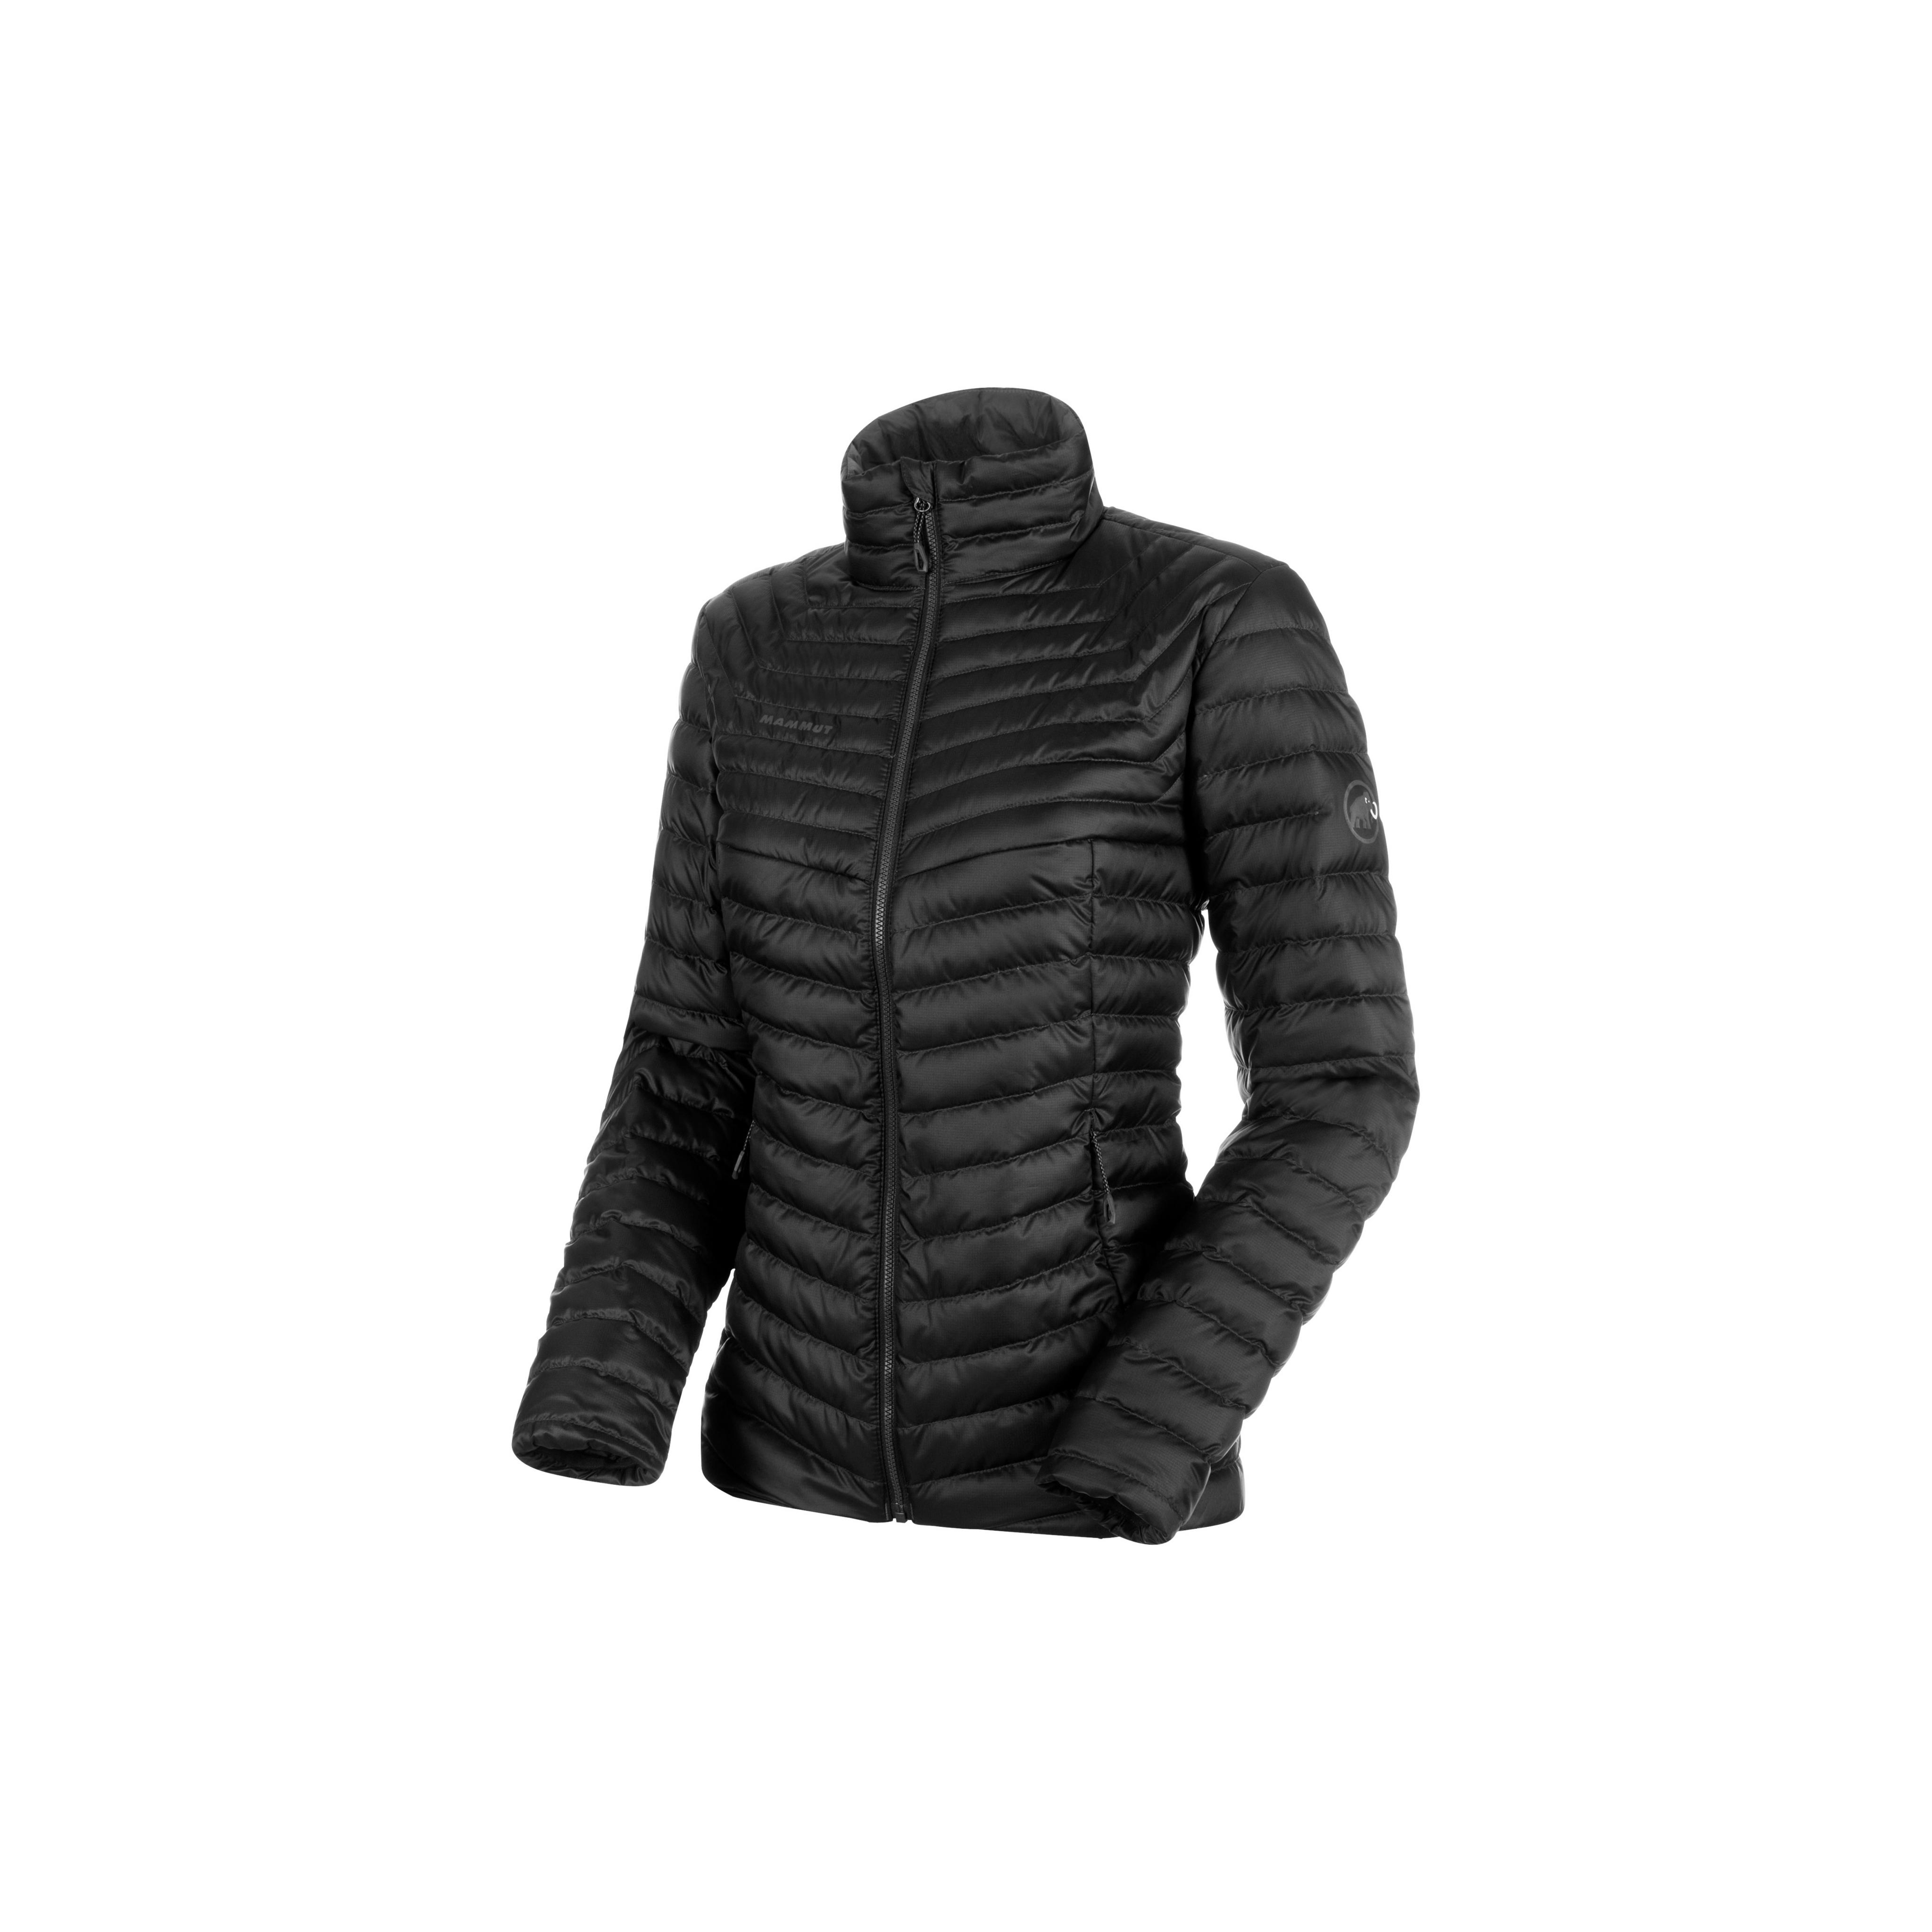 Convey IN Jacket Women - black-phantom, S thumbnail